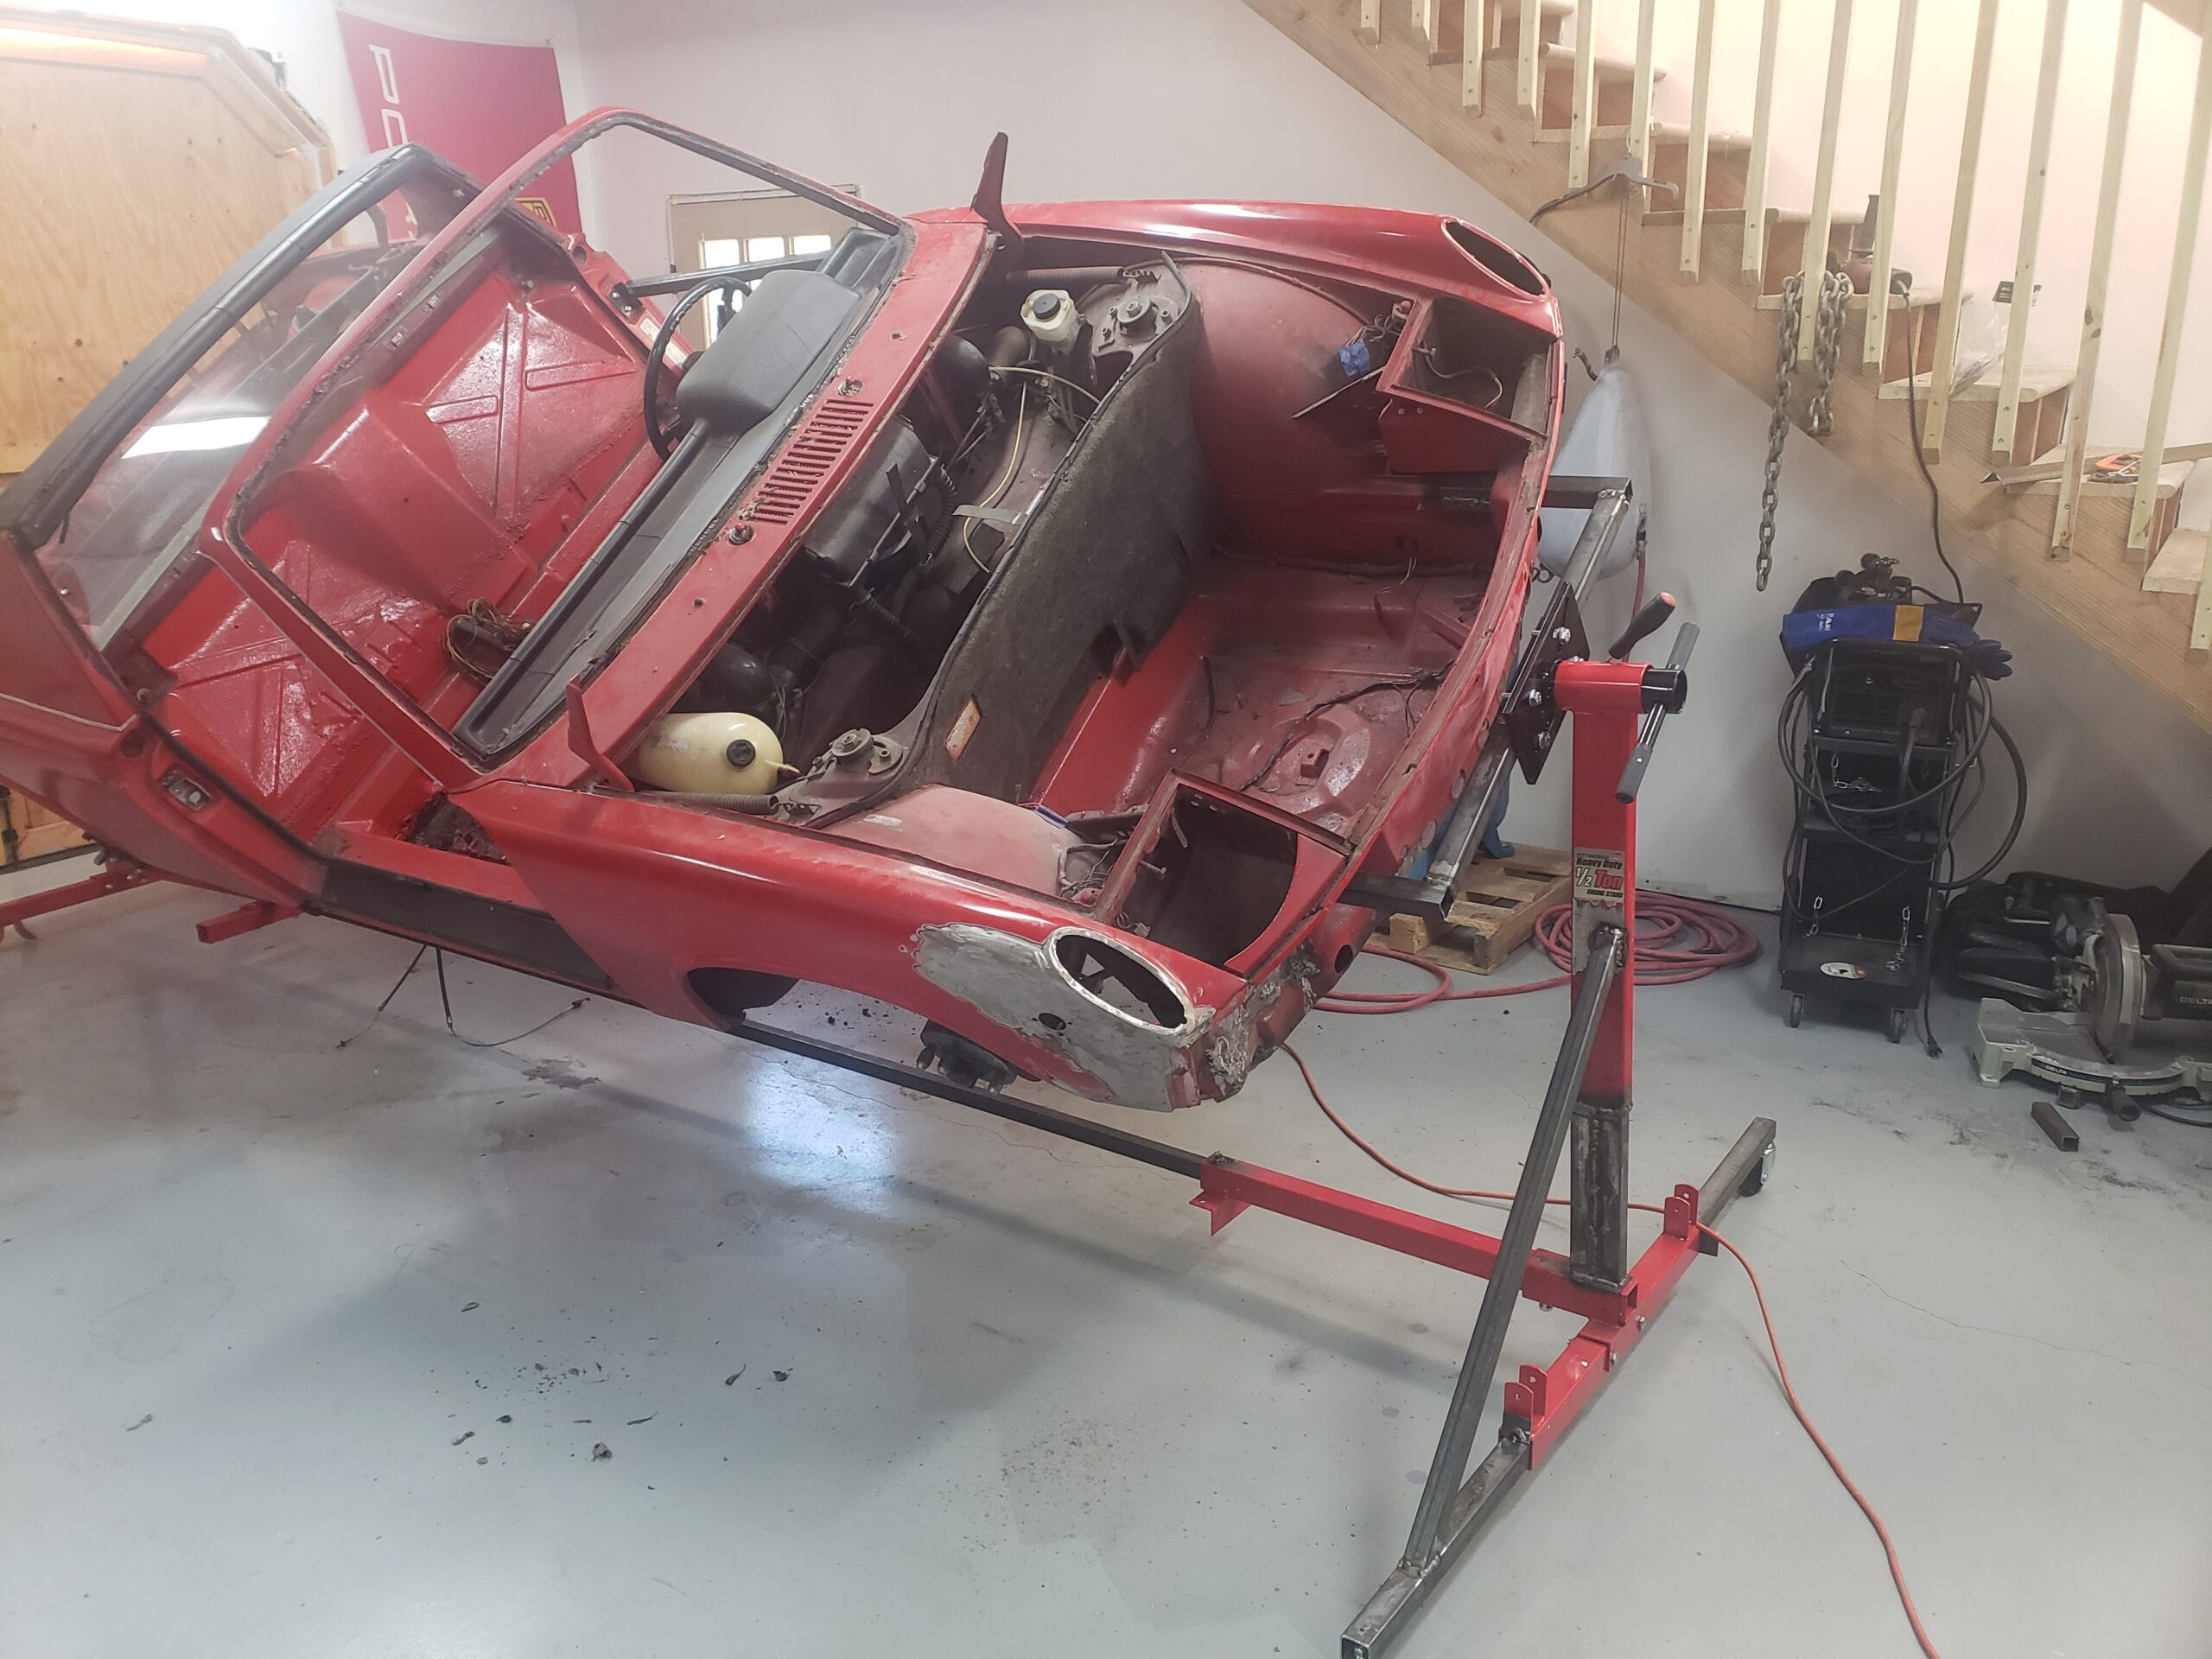 1975 Porsche 1.8 Liter Project